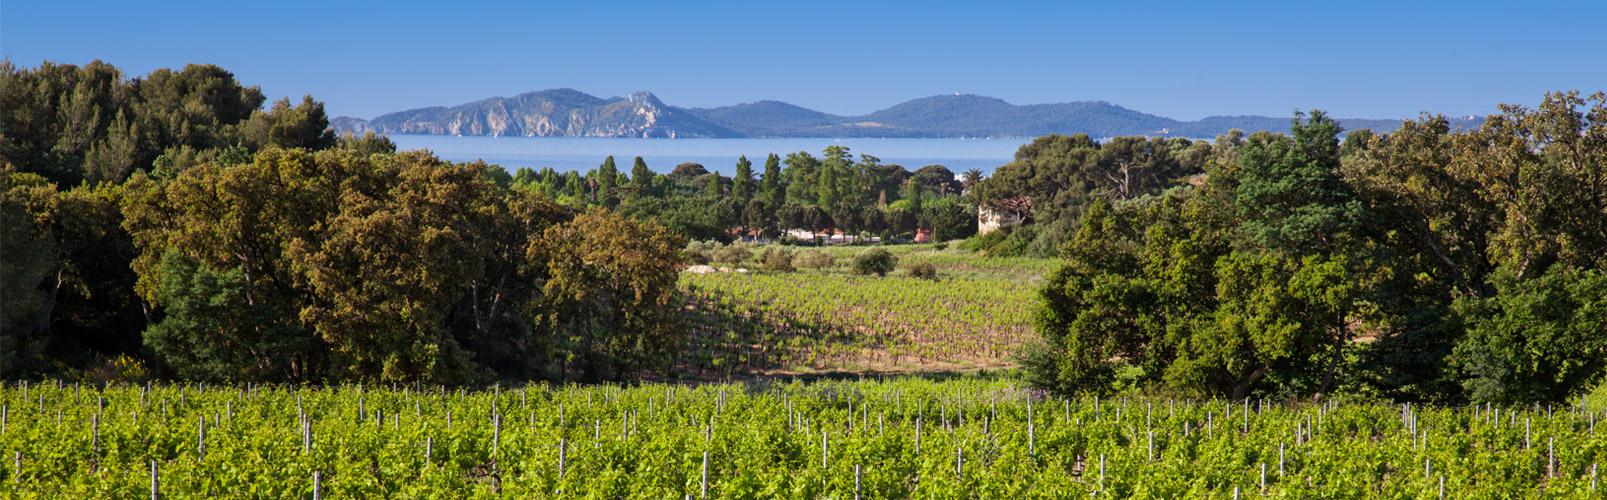 vin-chateau-bormettes-slider-6